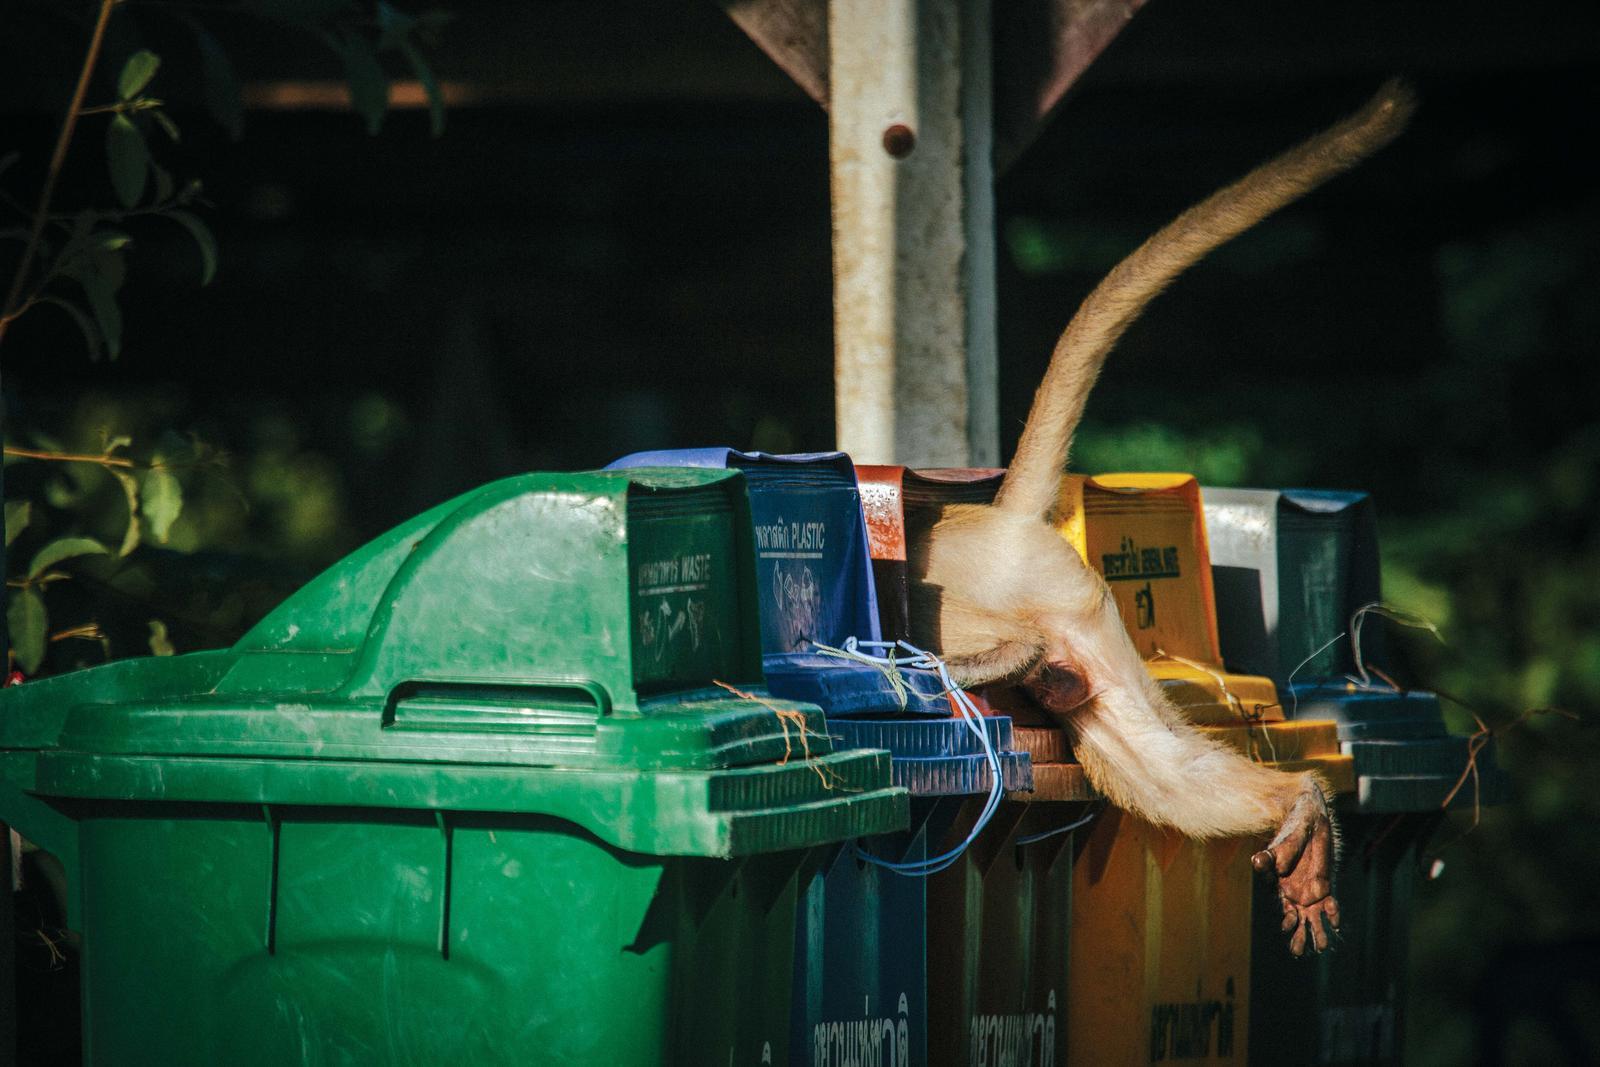 Morgan heim macaques in trash 3358